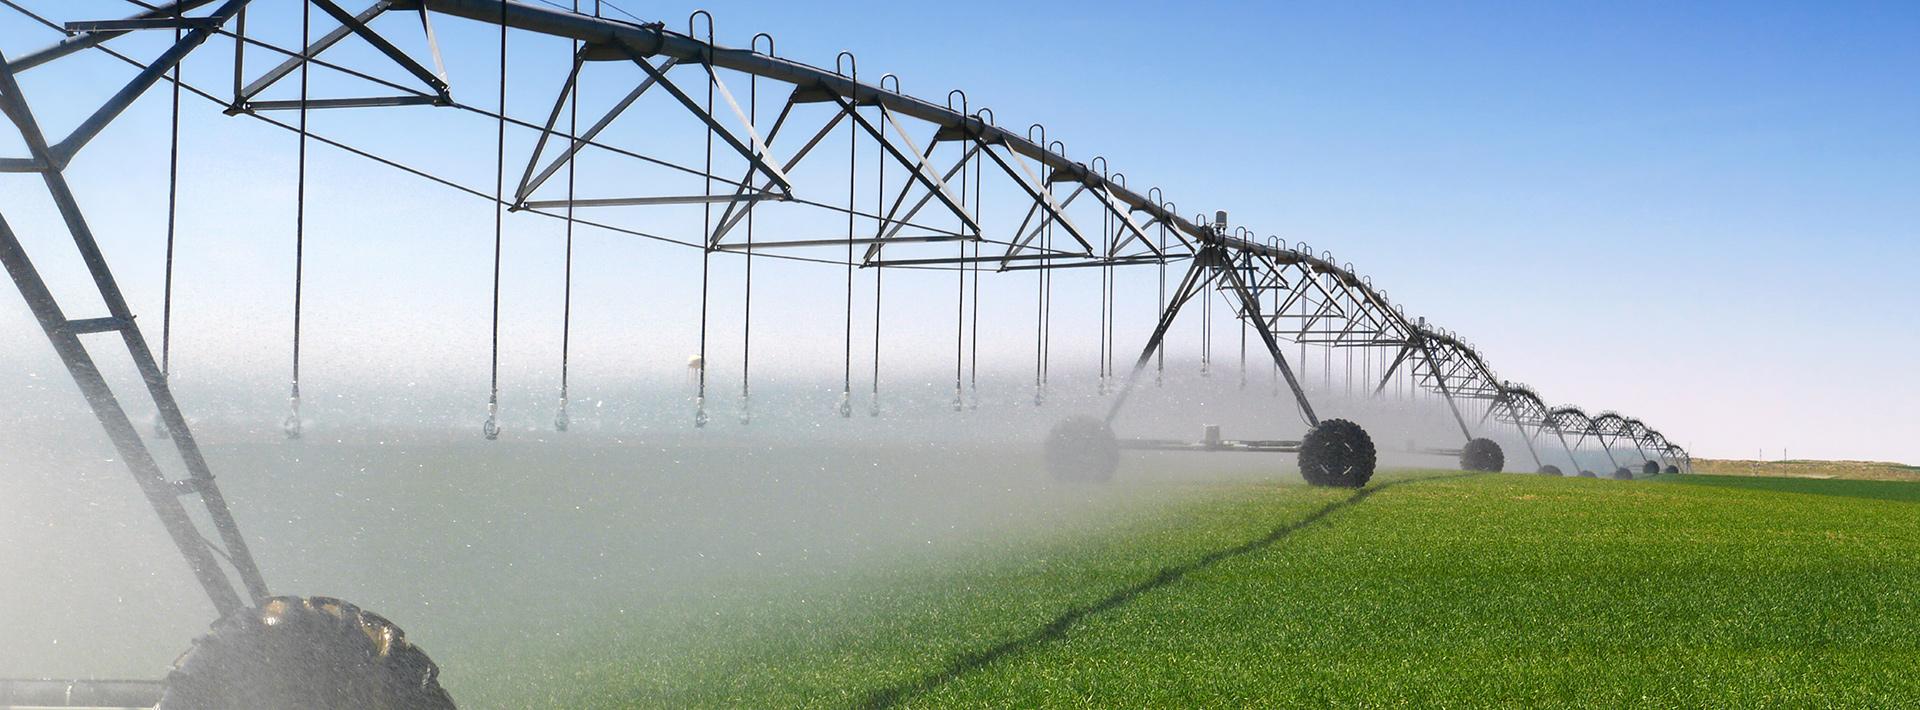 Big Data and Digital Agriculture Platforms - MIT CEE